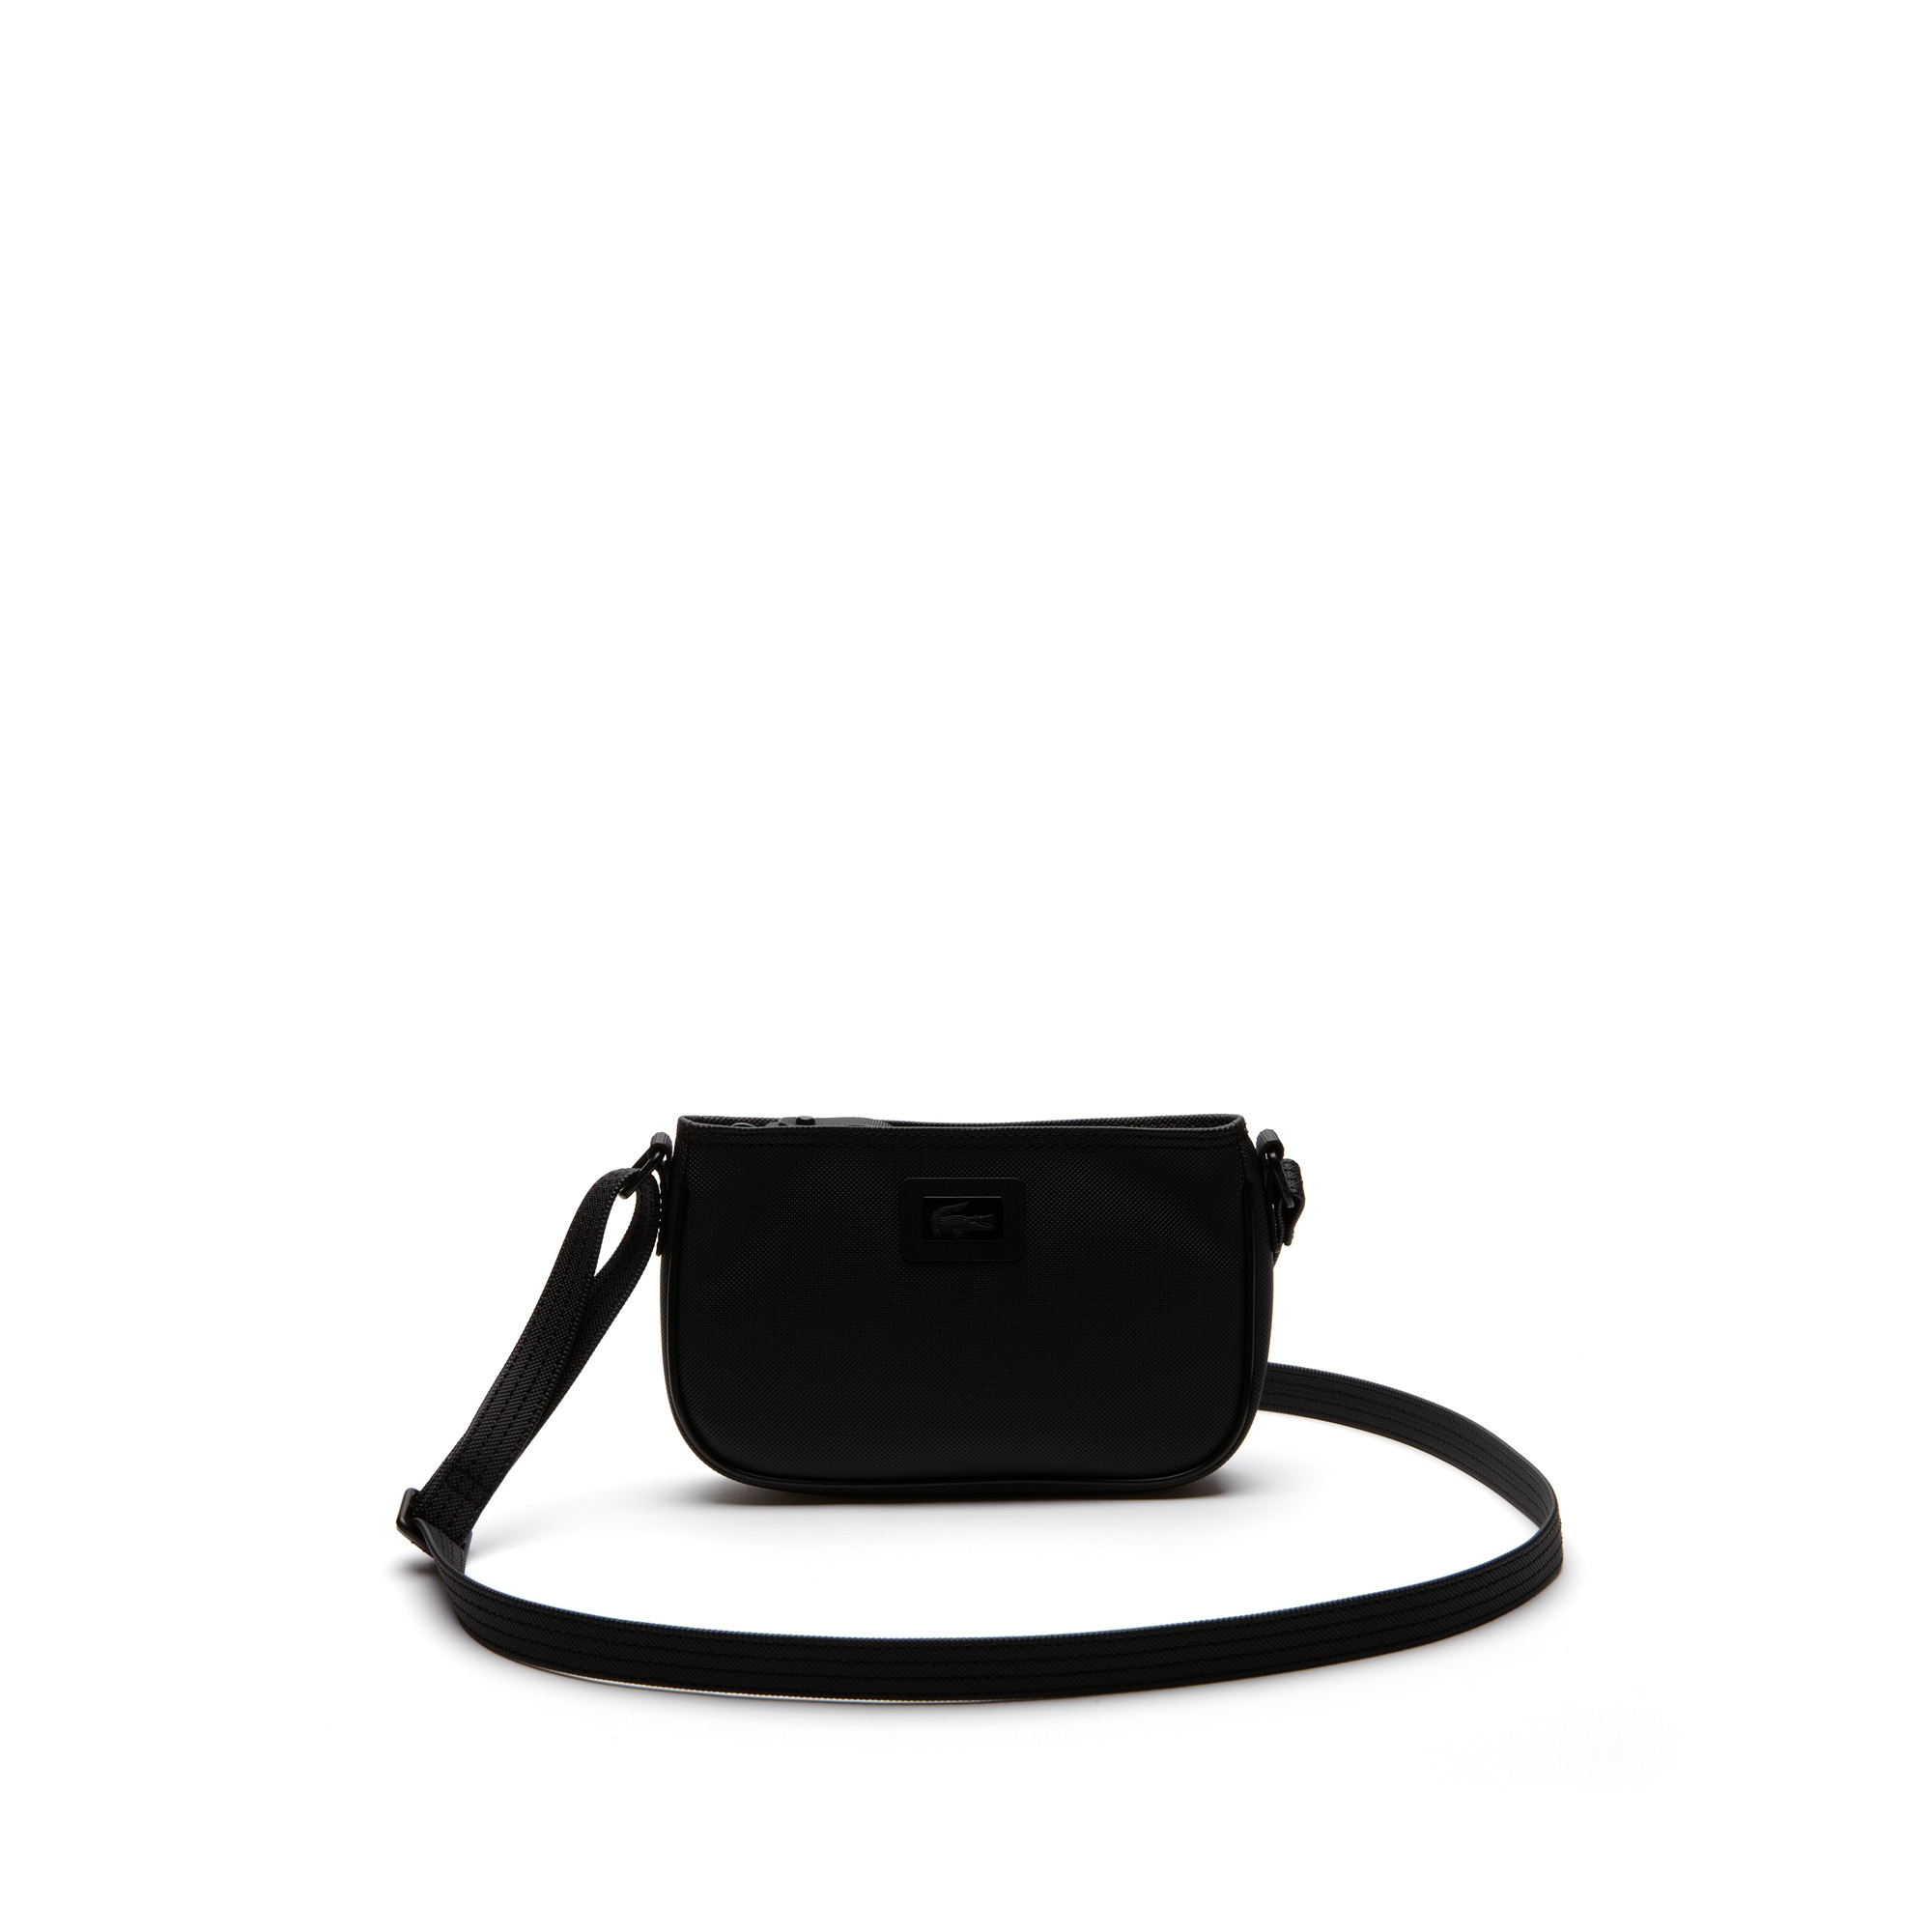 Women's Classic monochrome zippered clutch